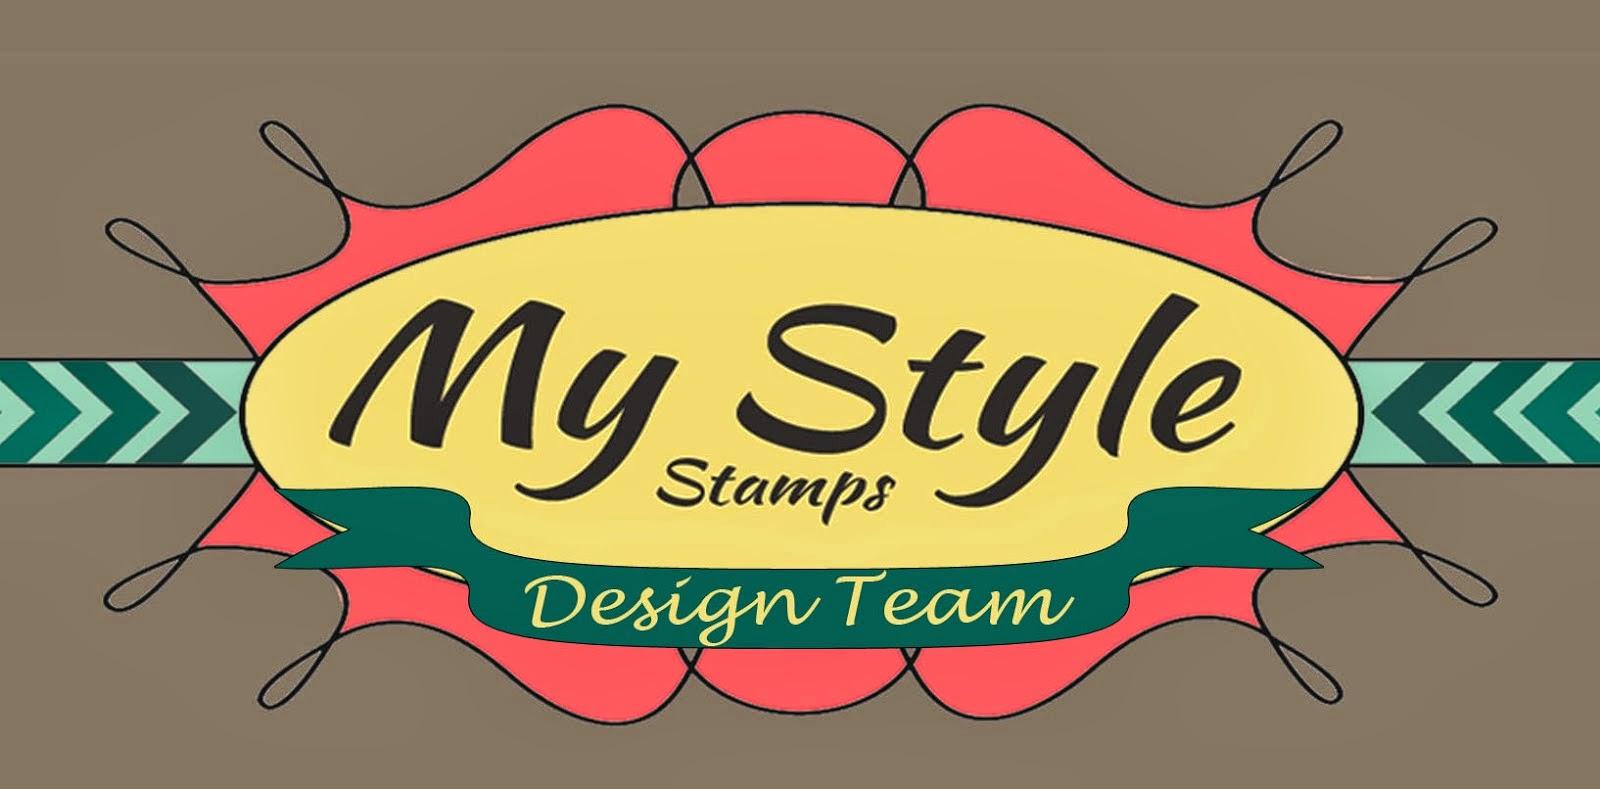 February guest Designer for